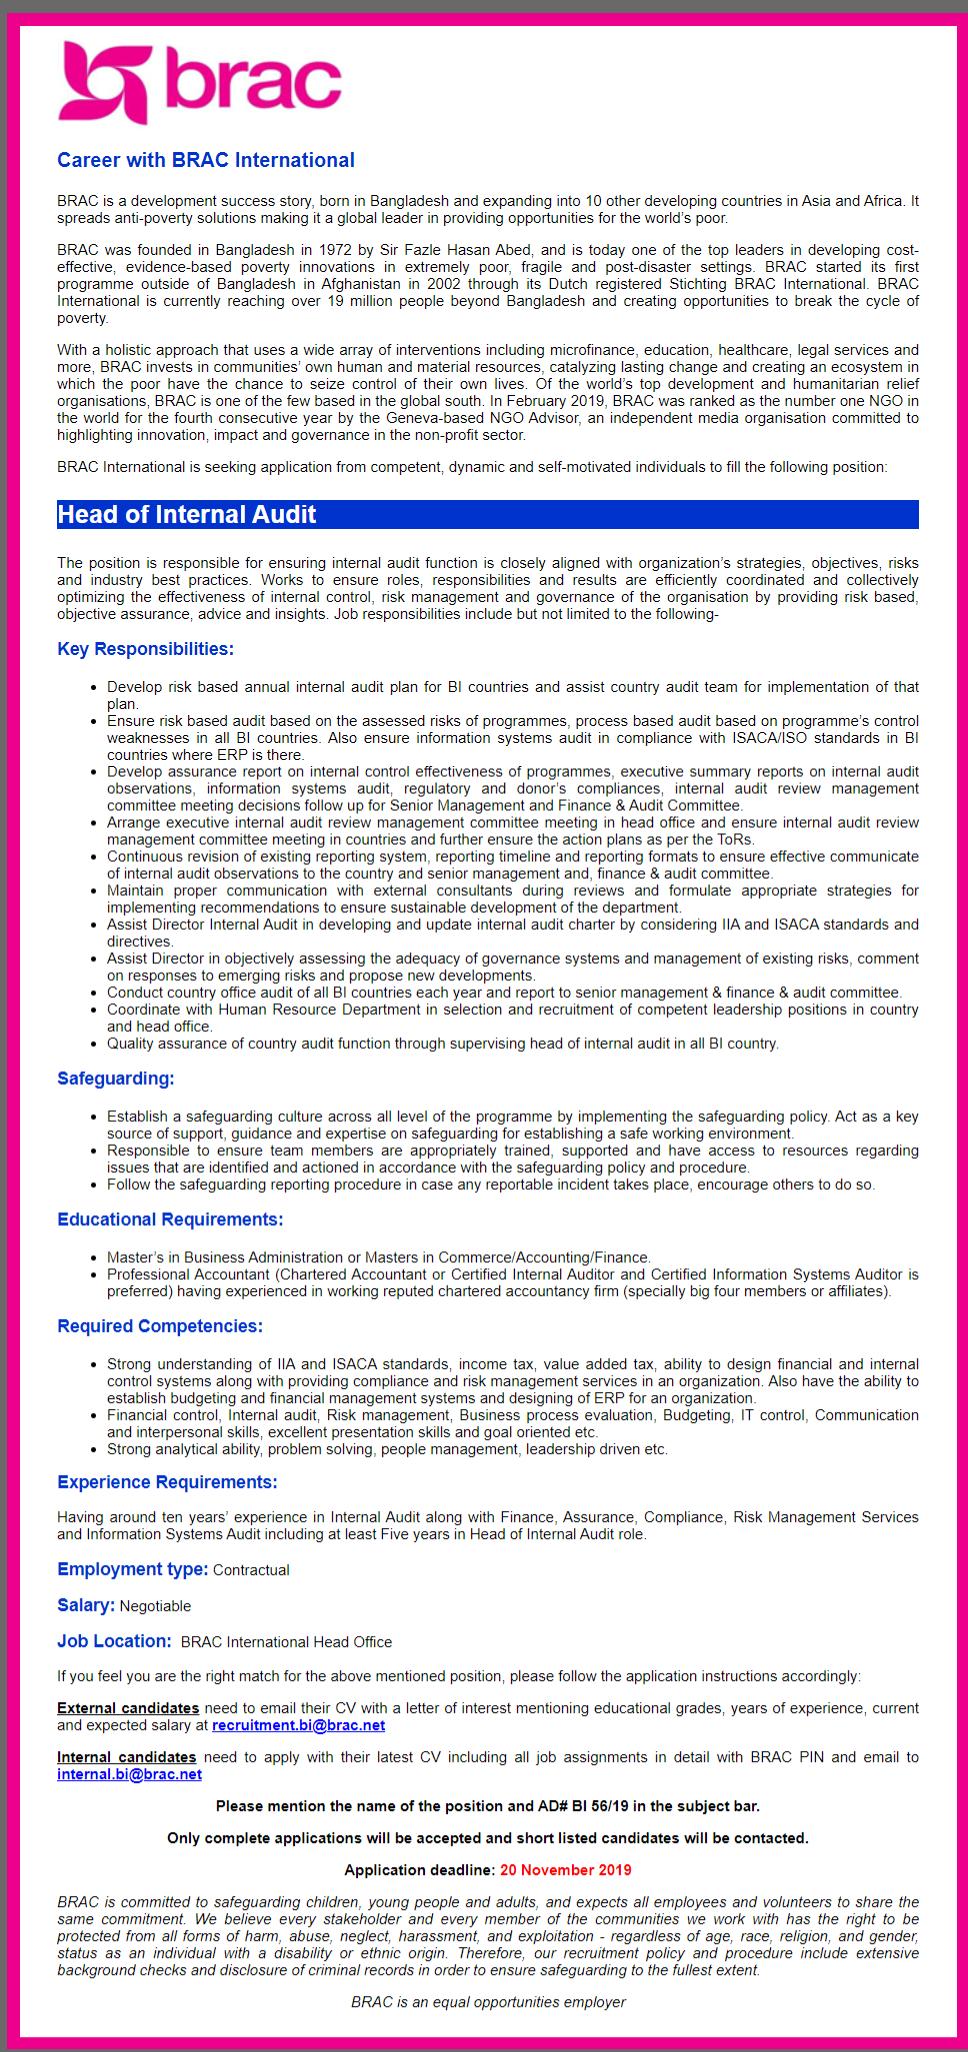 BRAC International Job Circular 2019